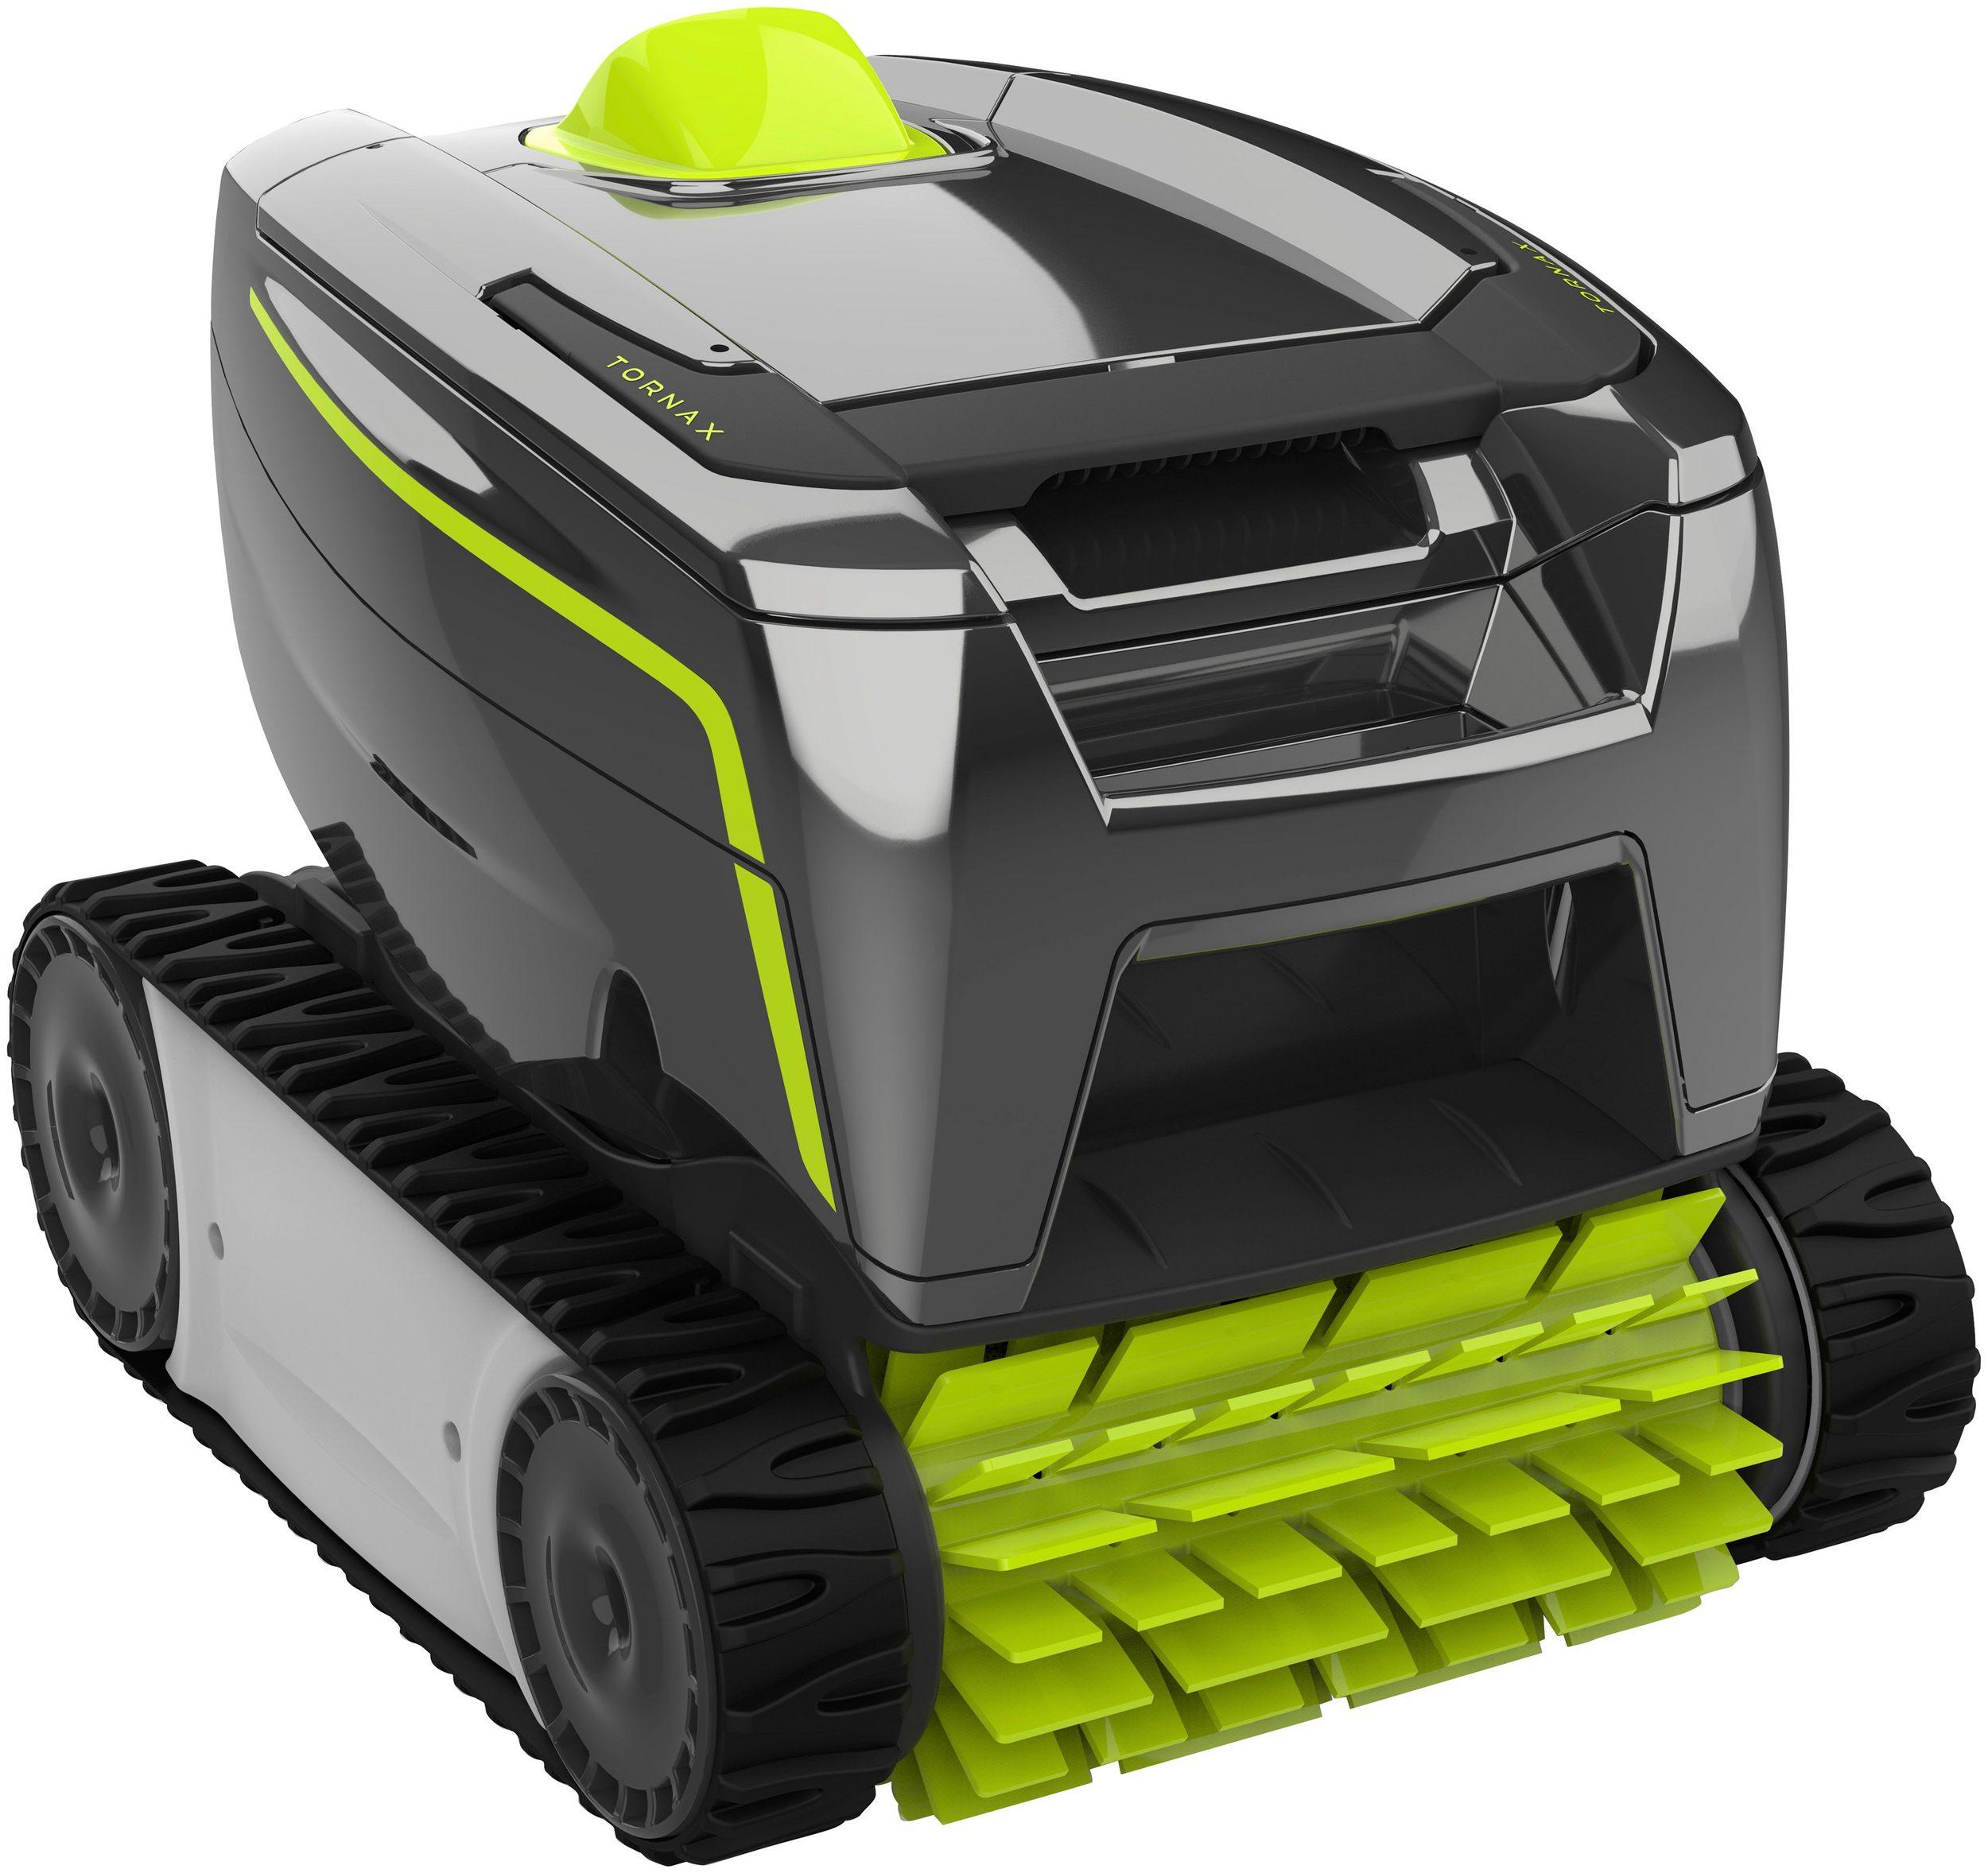 ZODIAC Poolroboter TORNAX GT2120